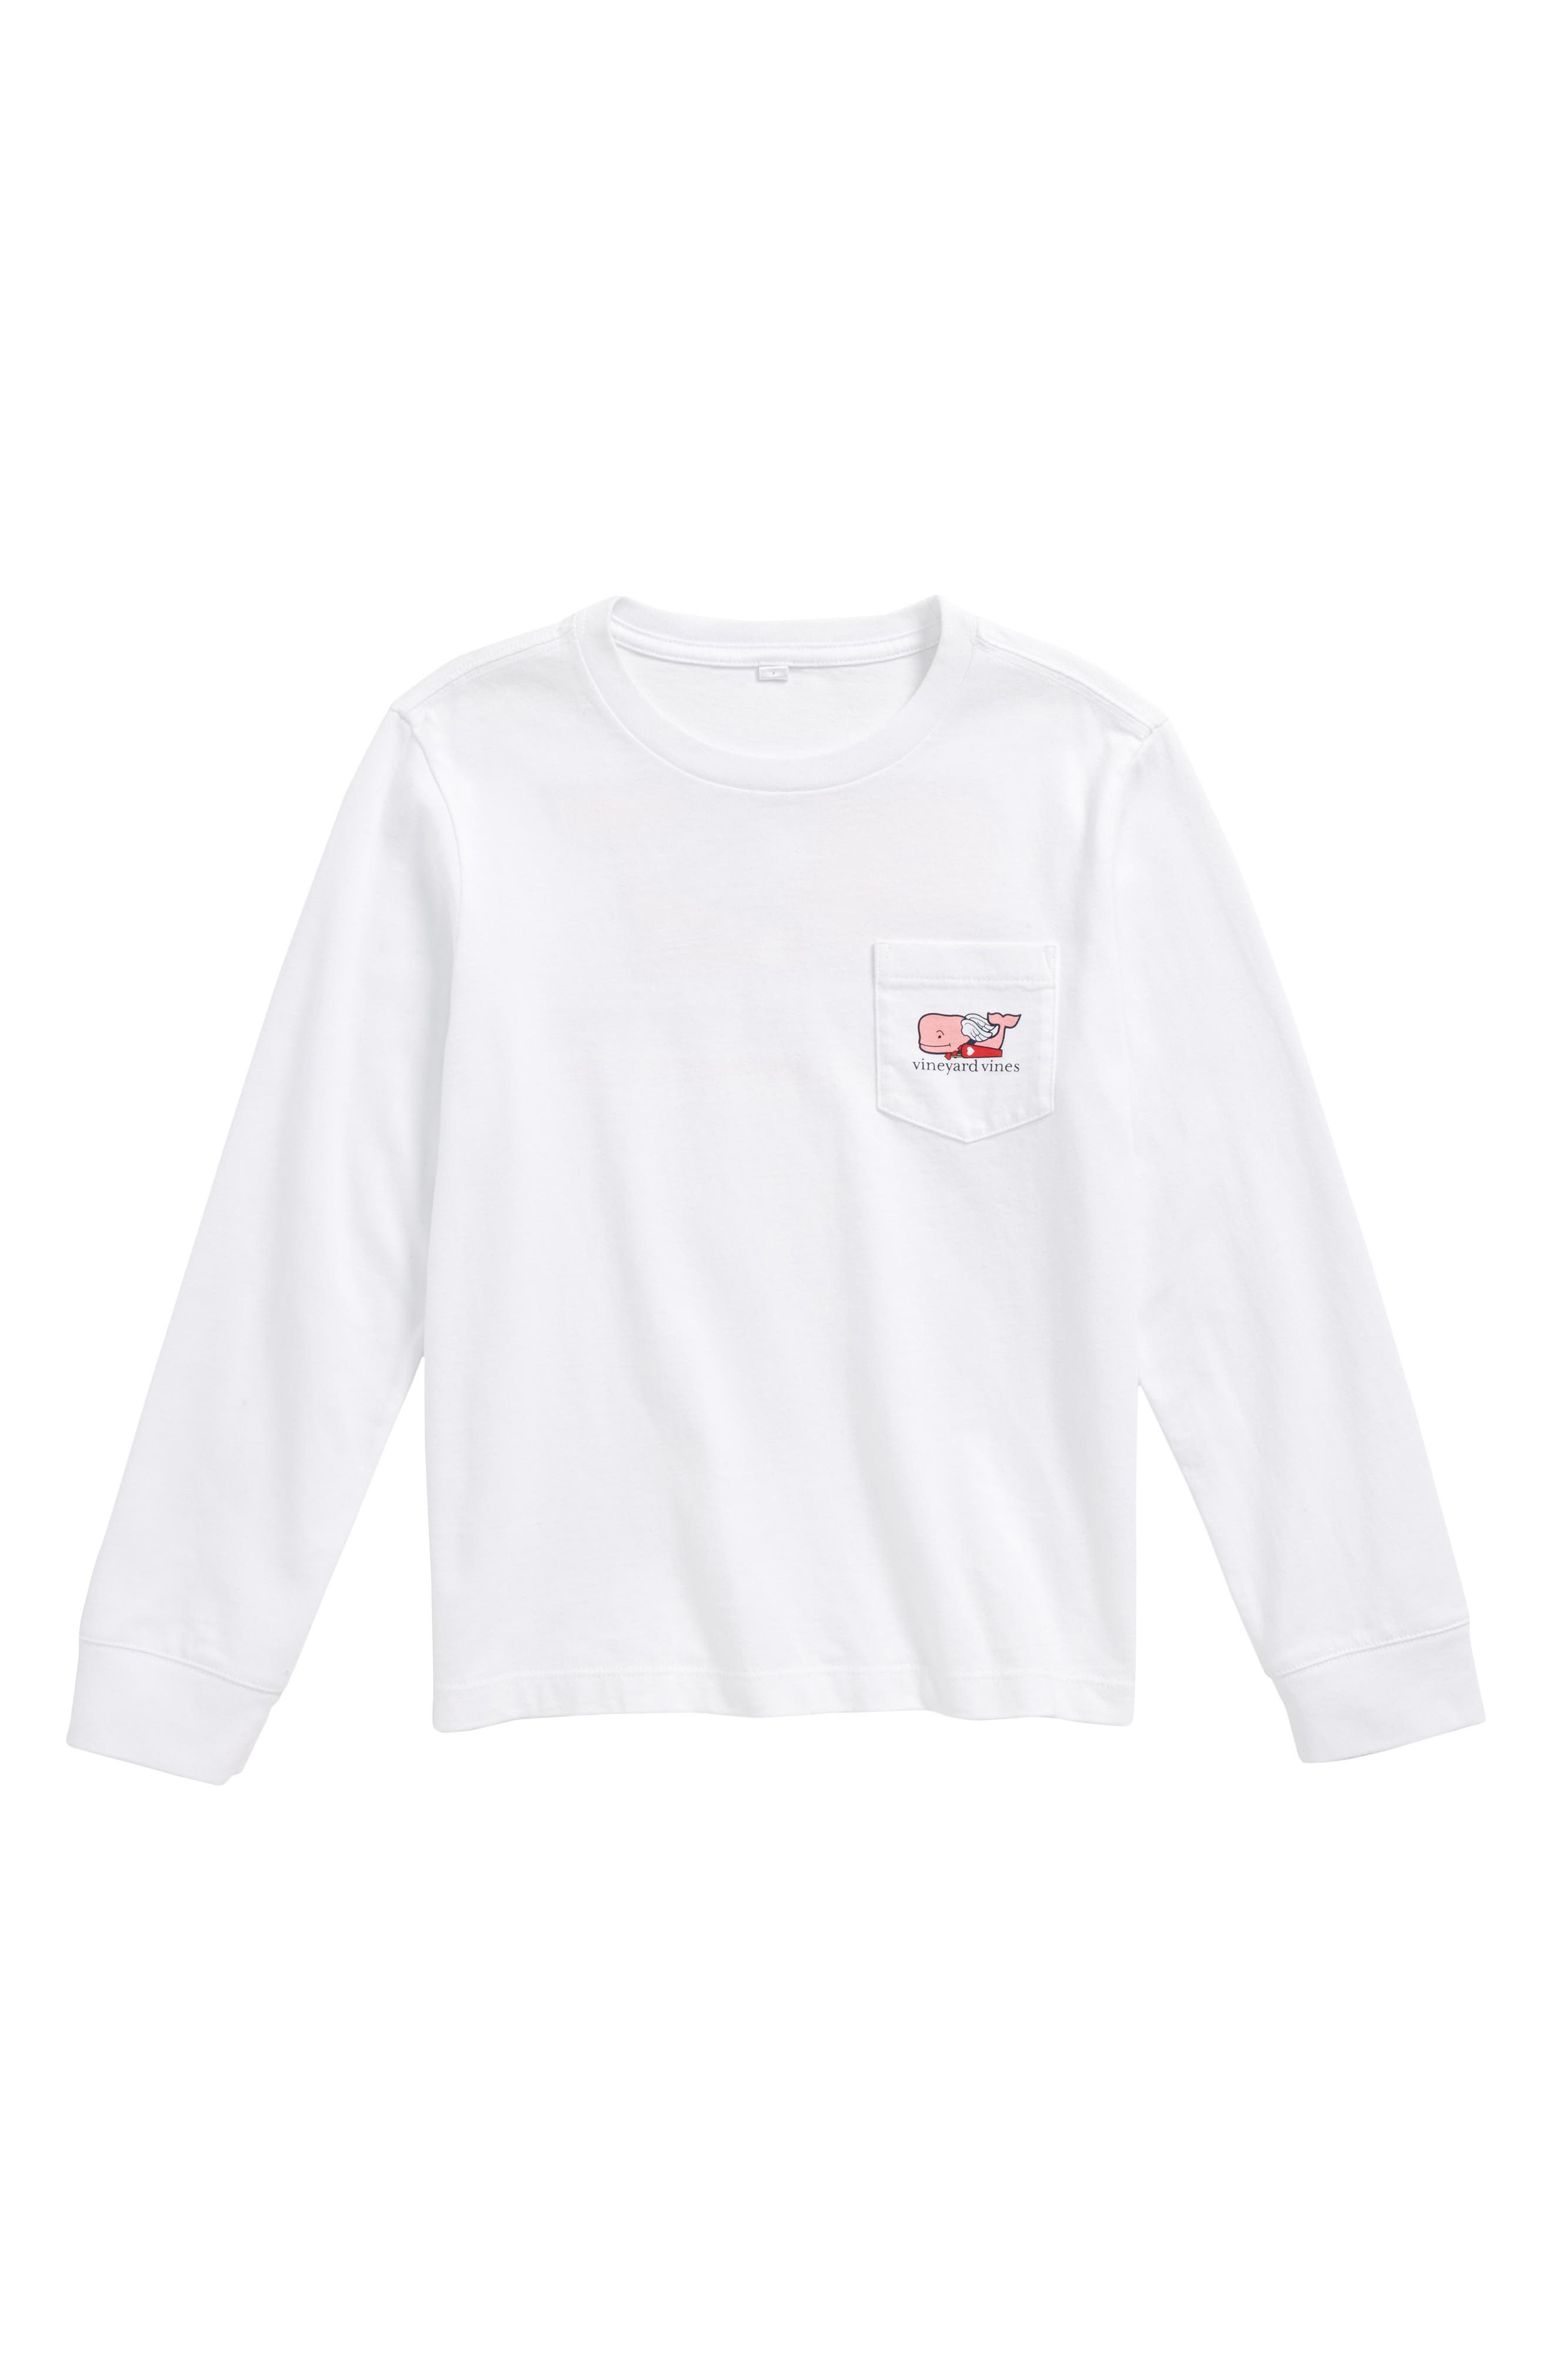 Main Image - vineyard vines Cupid Whale Pocket T-Shirt (Big Boys)